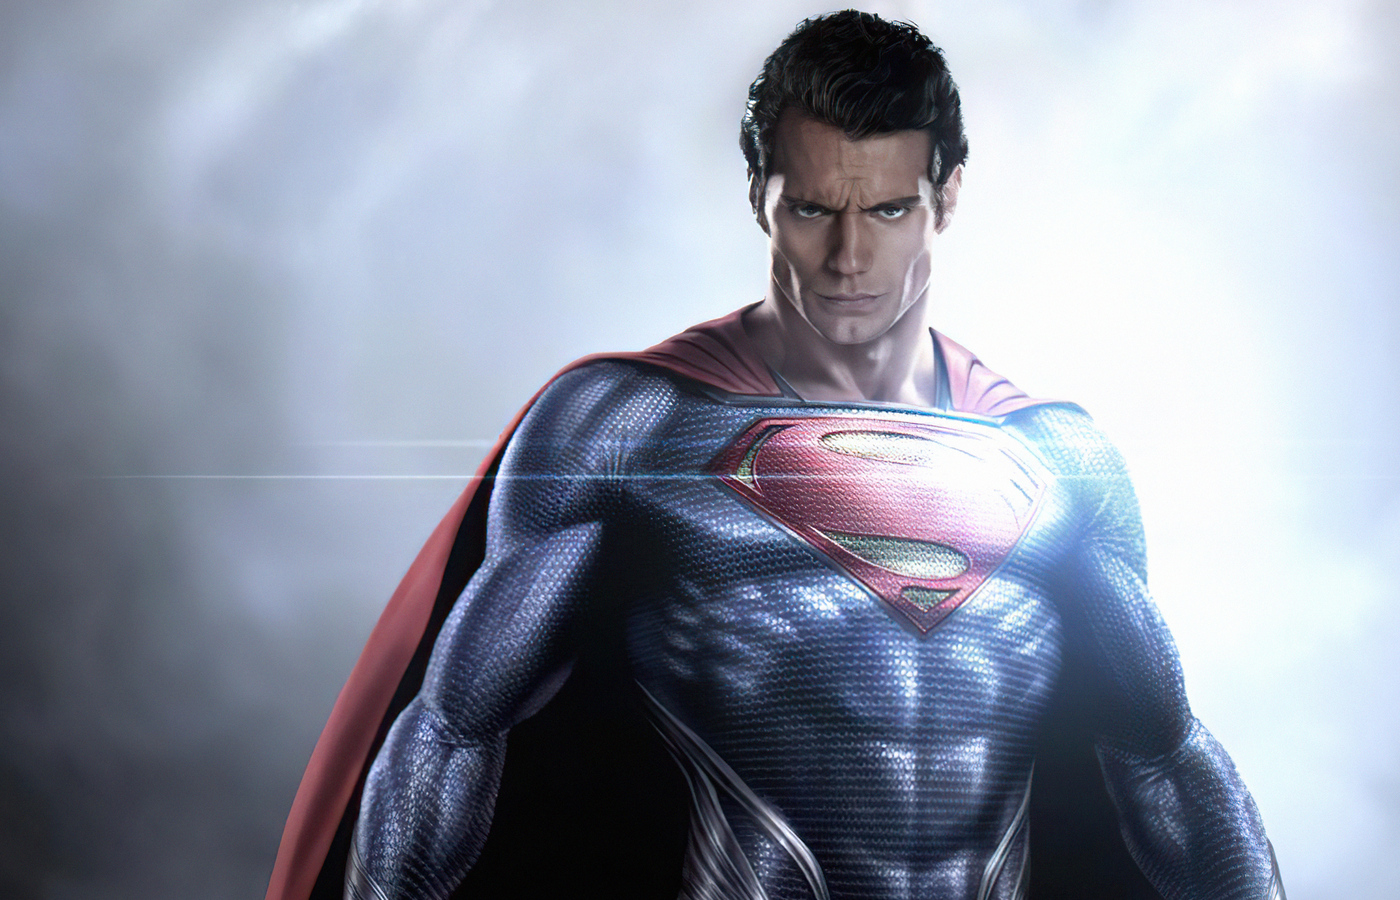 the-superman-man-of-steel-4k-tp.jpg